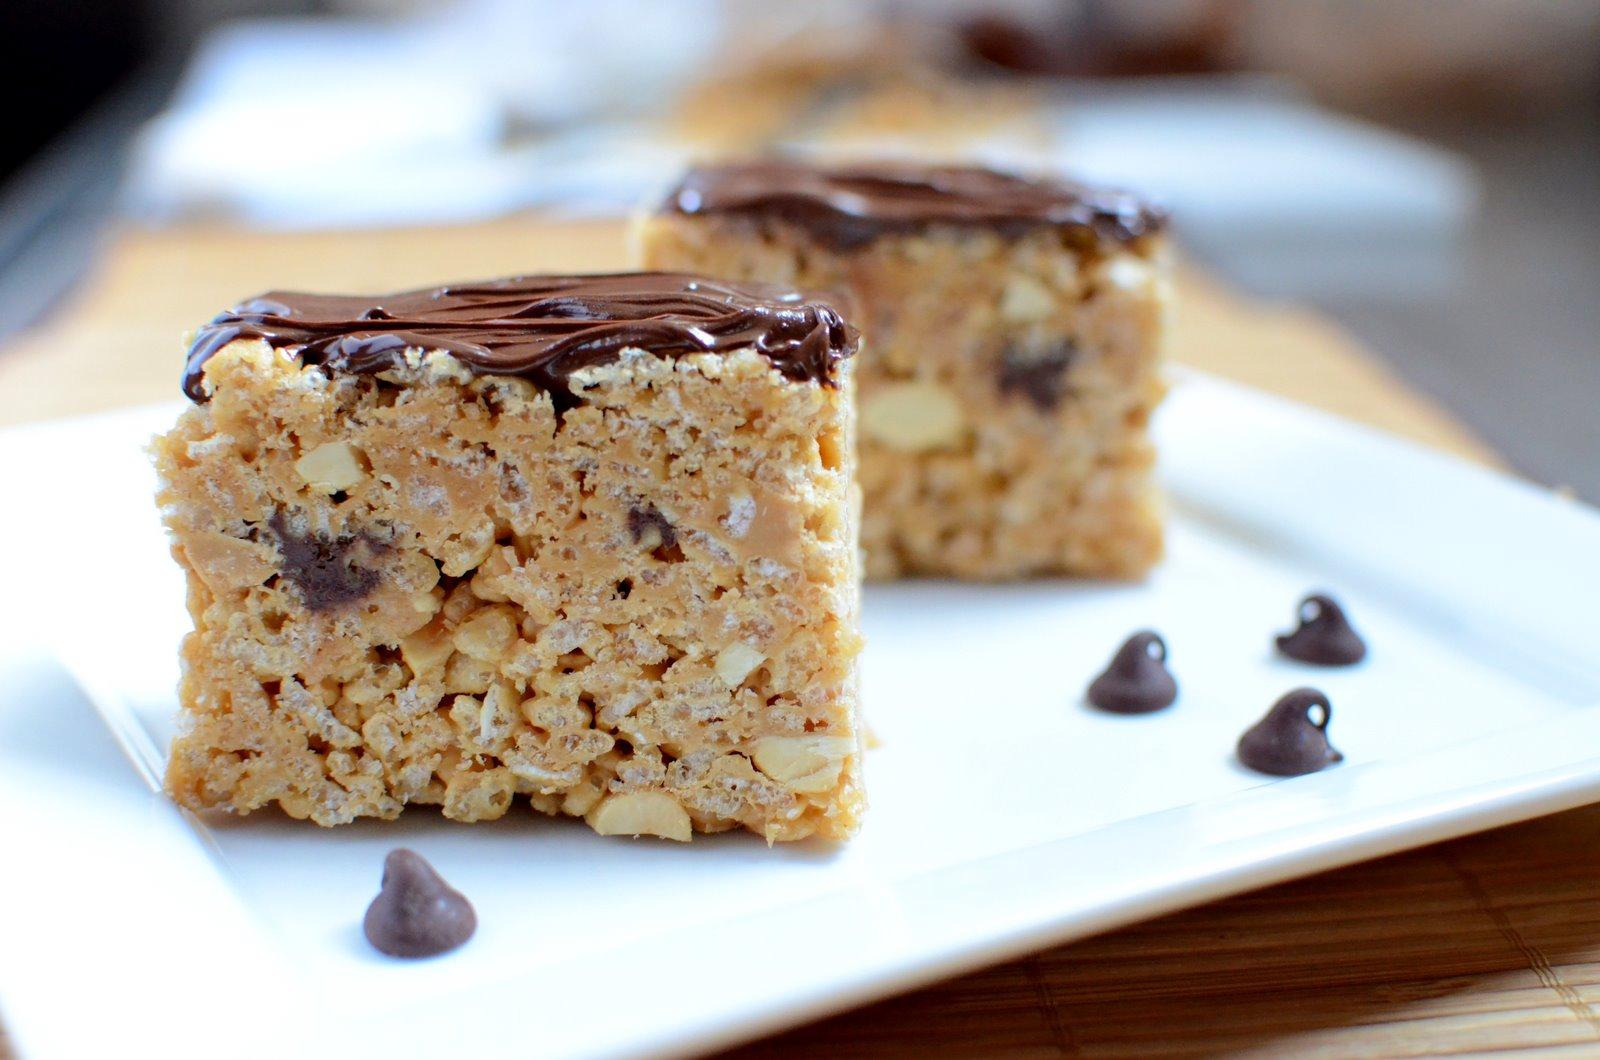 The Church Cook: Peanut Butter Rice Crispy Bars